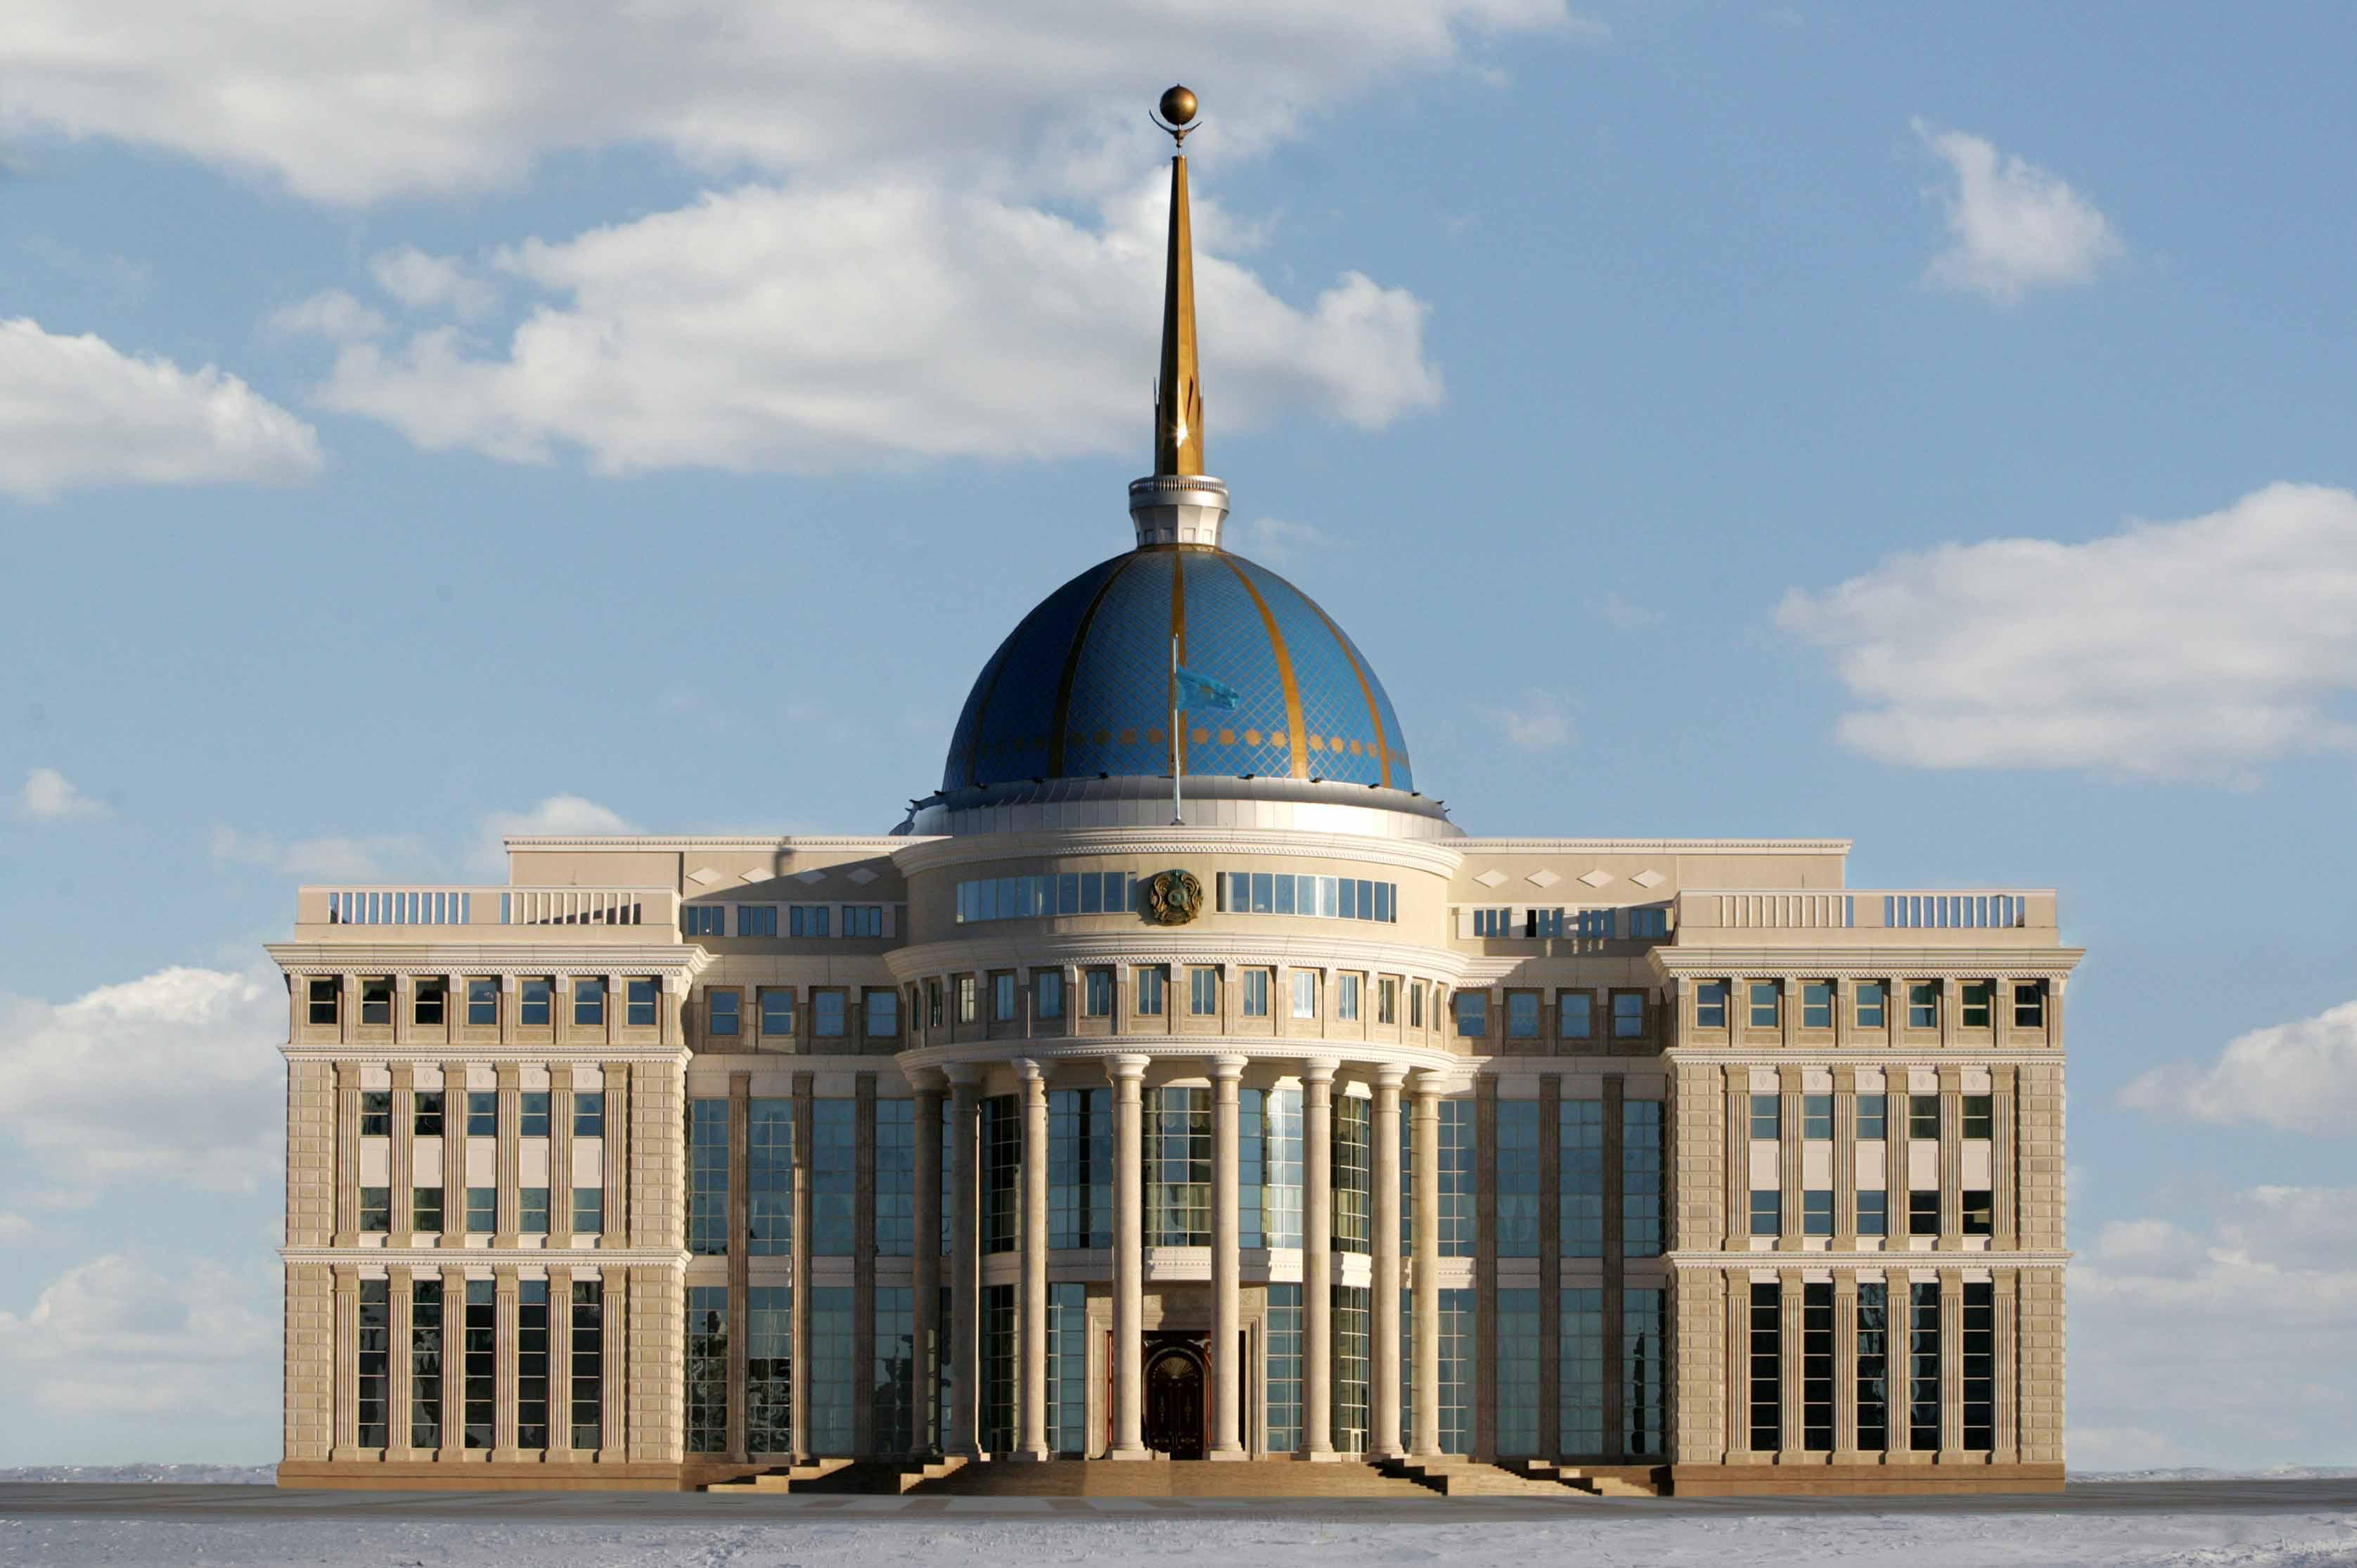 Нұрсұлтан Назарбаев Ақорда резиденциясынан көшеді